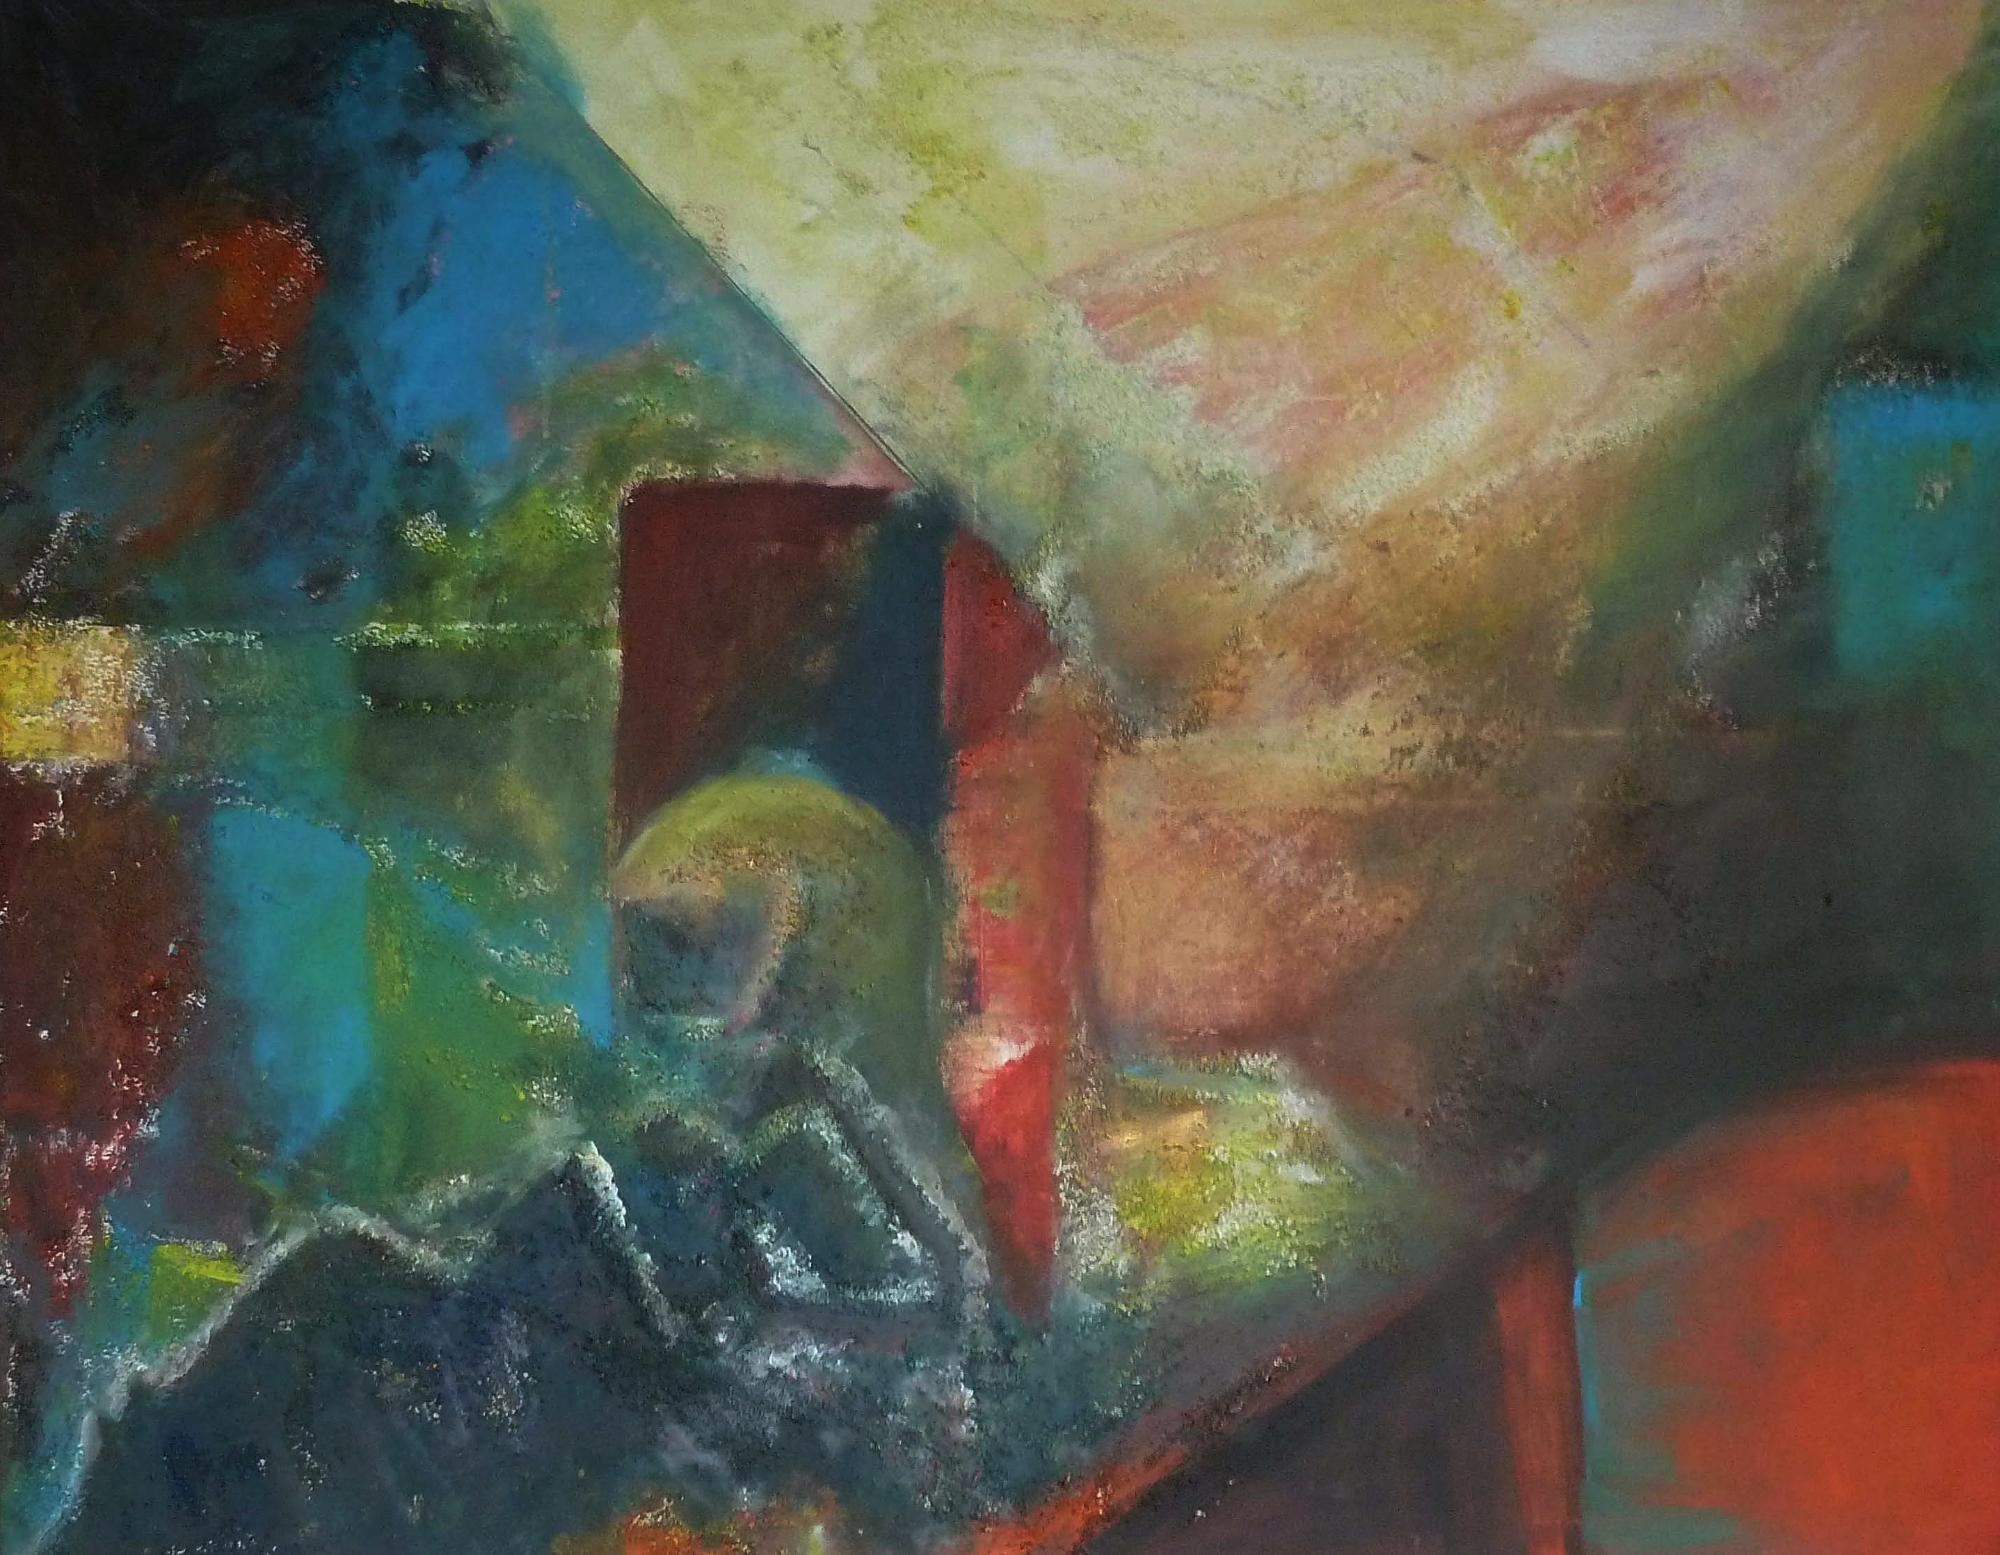 2015 - Rhodt - Abstrakt, 100x80cm, Acryl-Spachteln